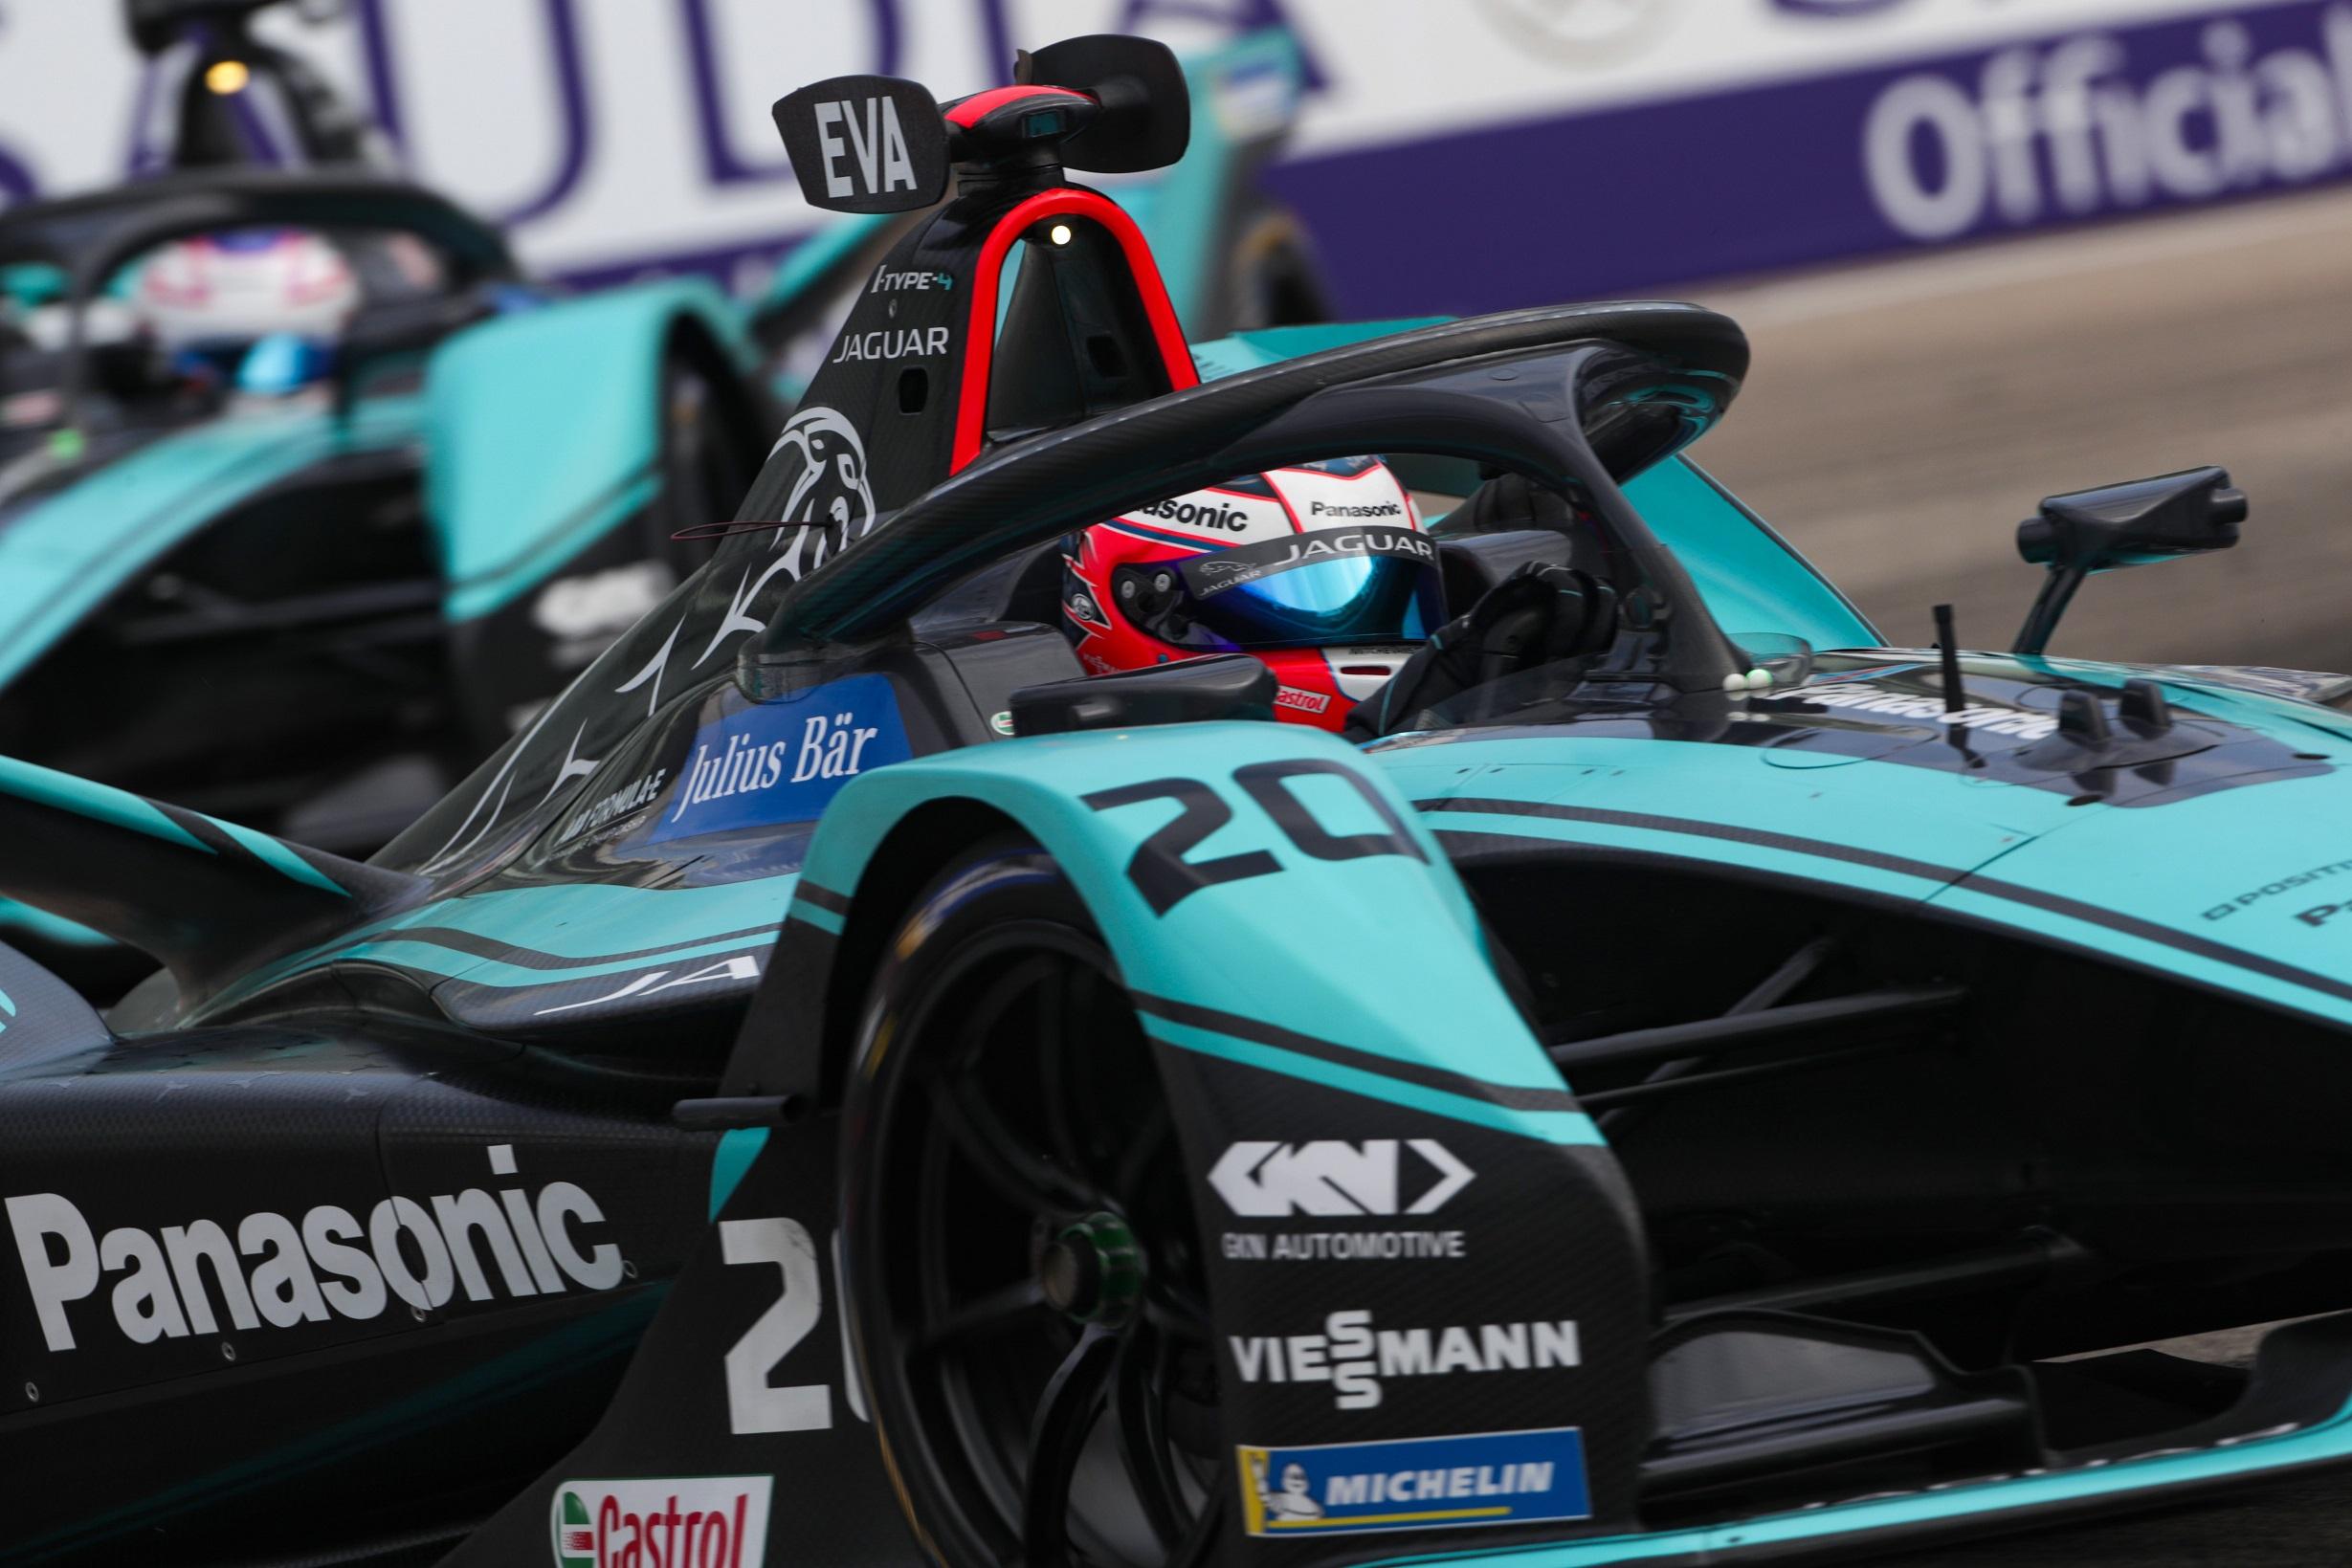 Panasonic jaguar racing focus on the future after challenging season six finale